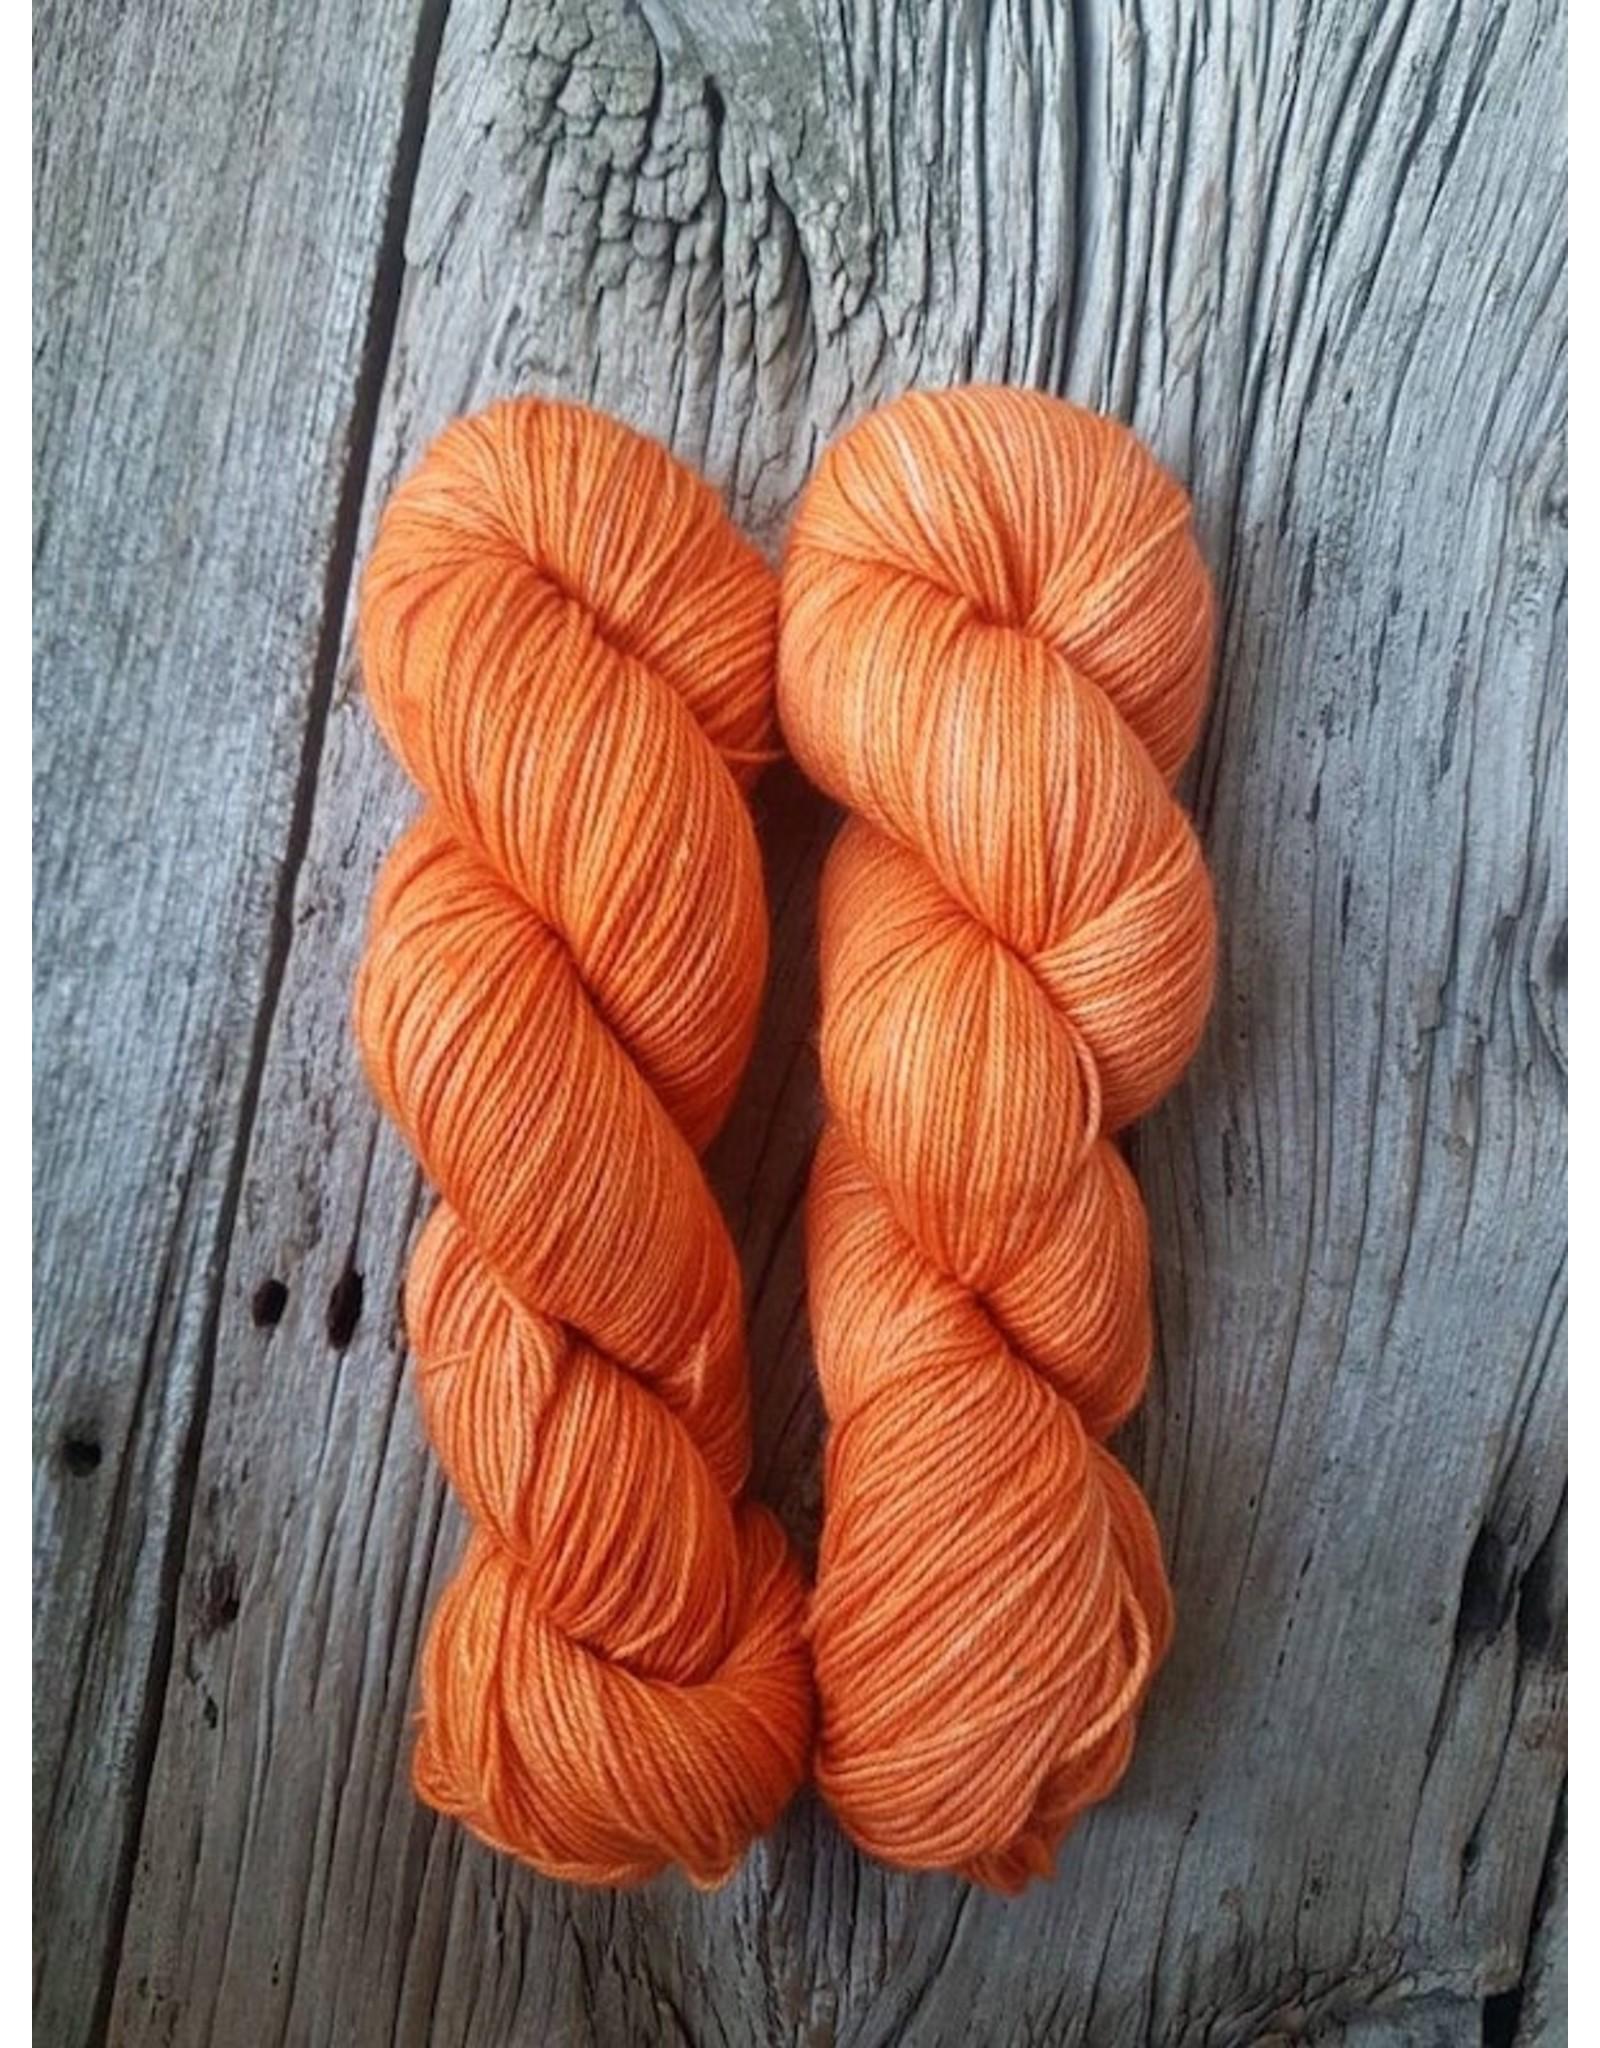 Stitch Noir Stitch Noir Sock 80/20 NEW ARRIVALS!